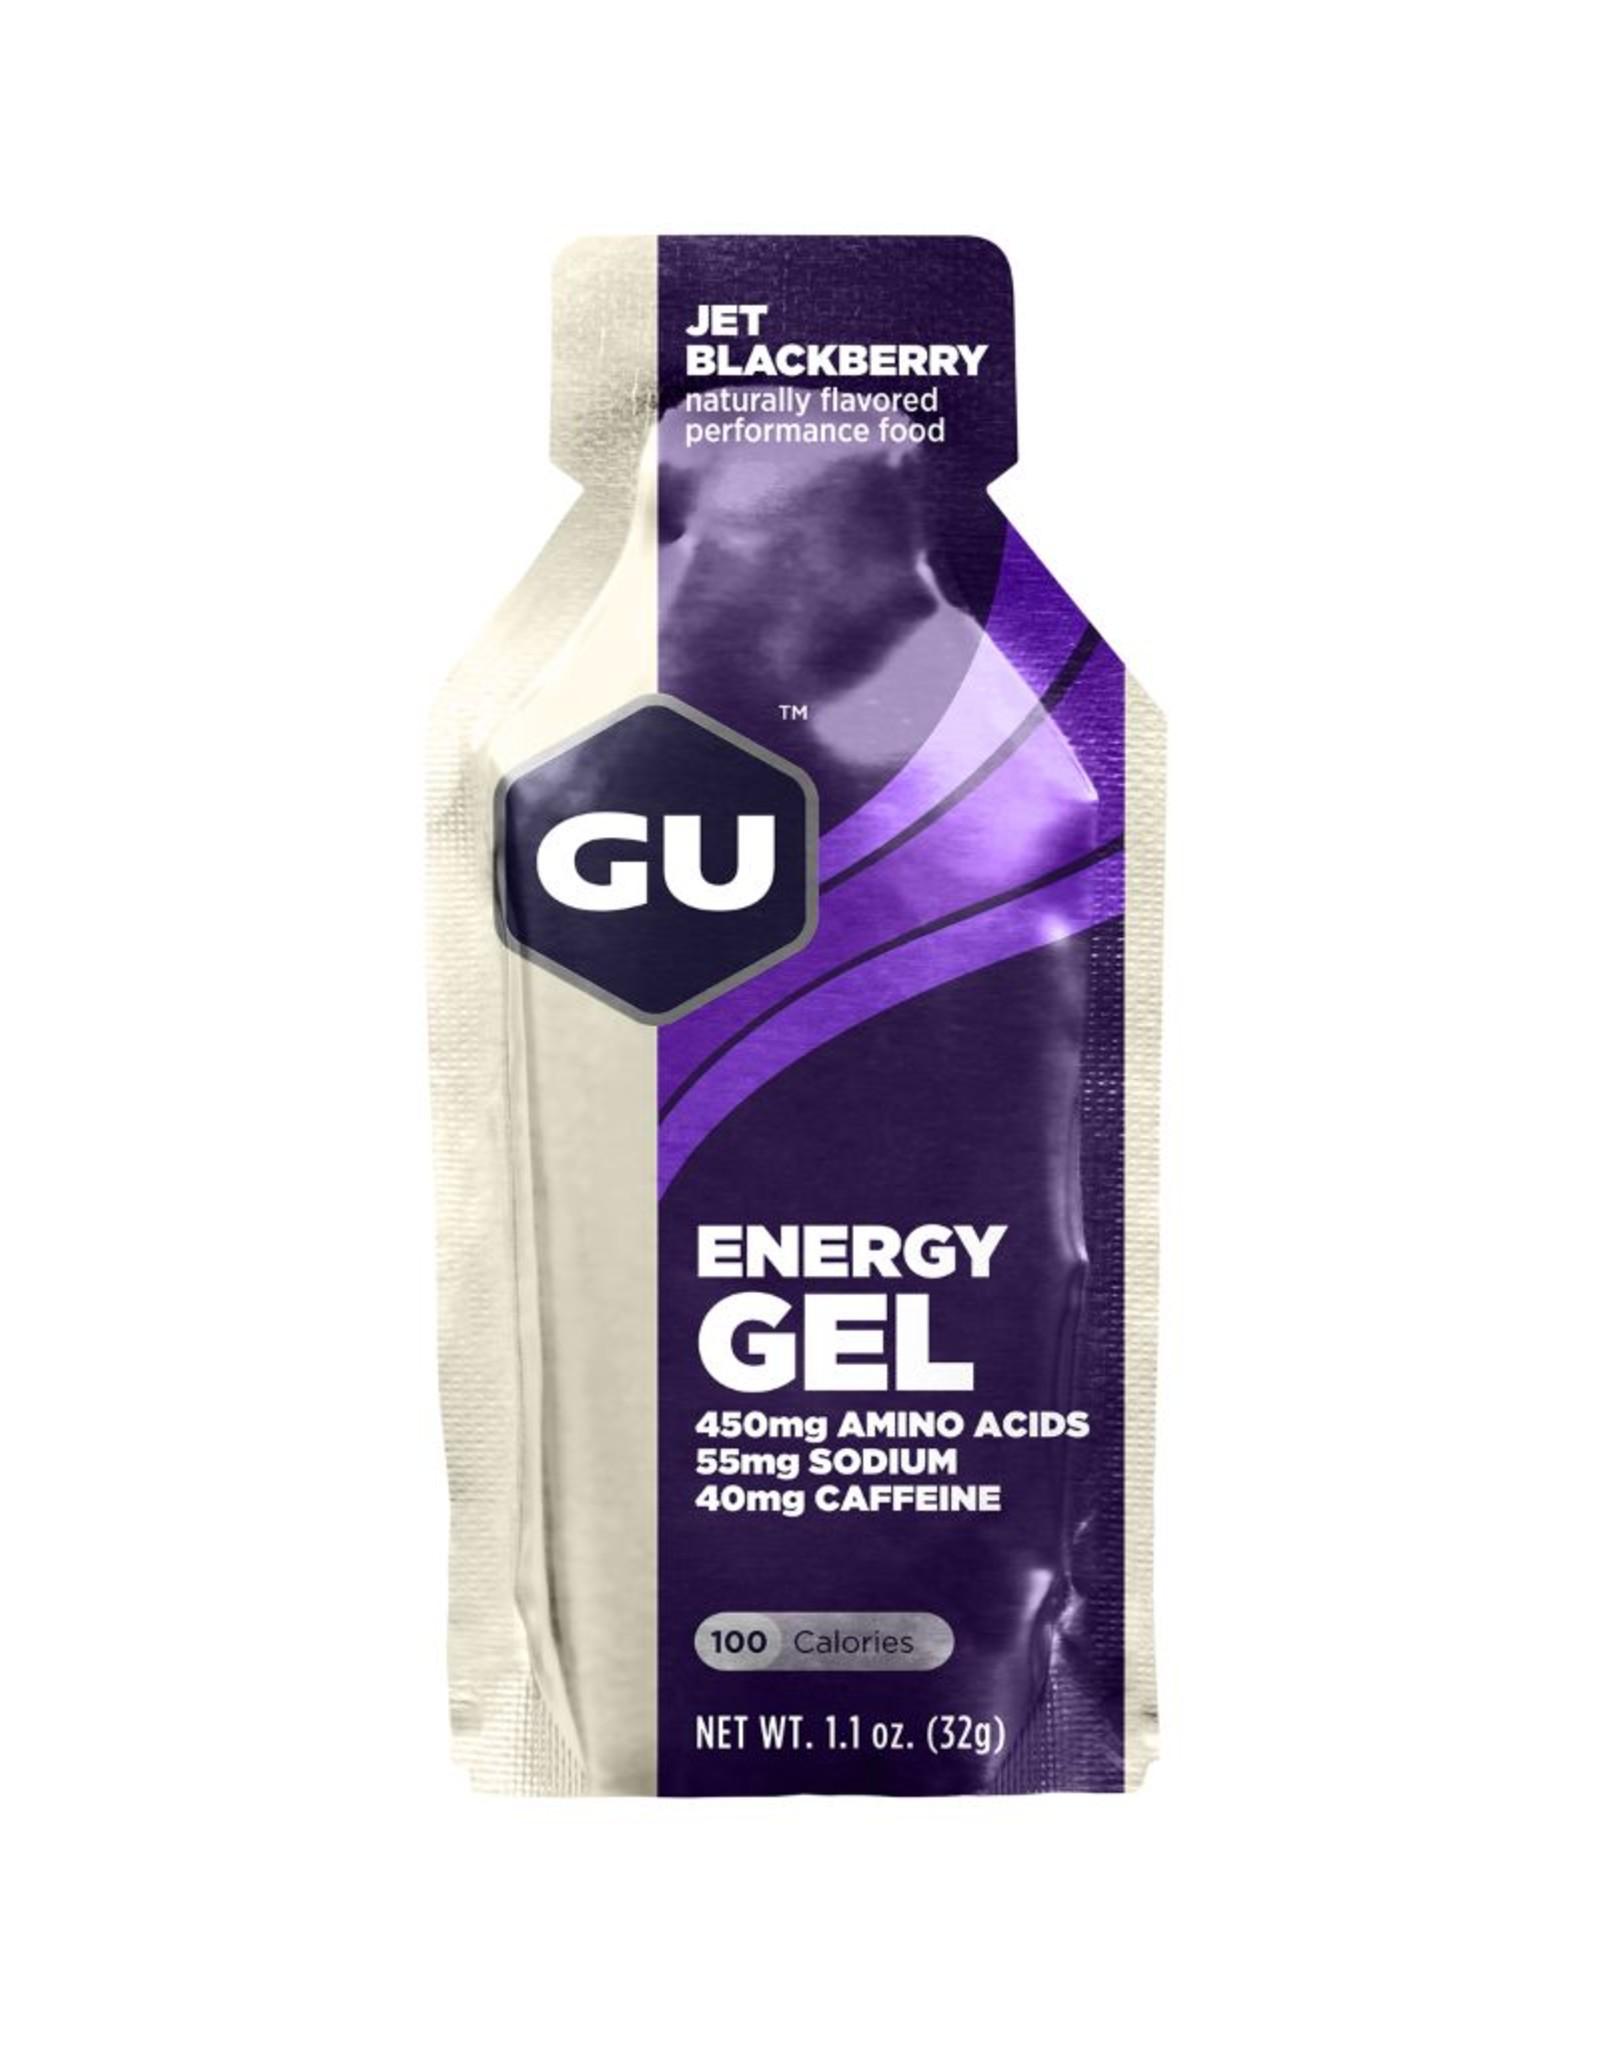 GU Energy Gel - Jet Blackberry